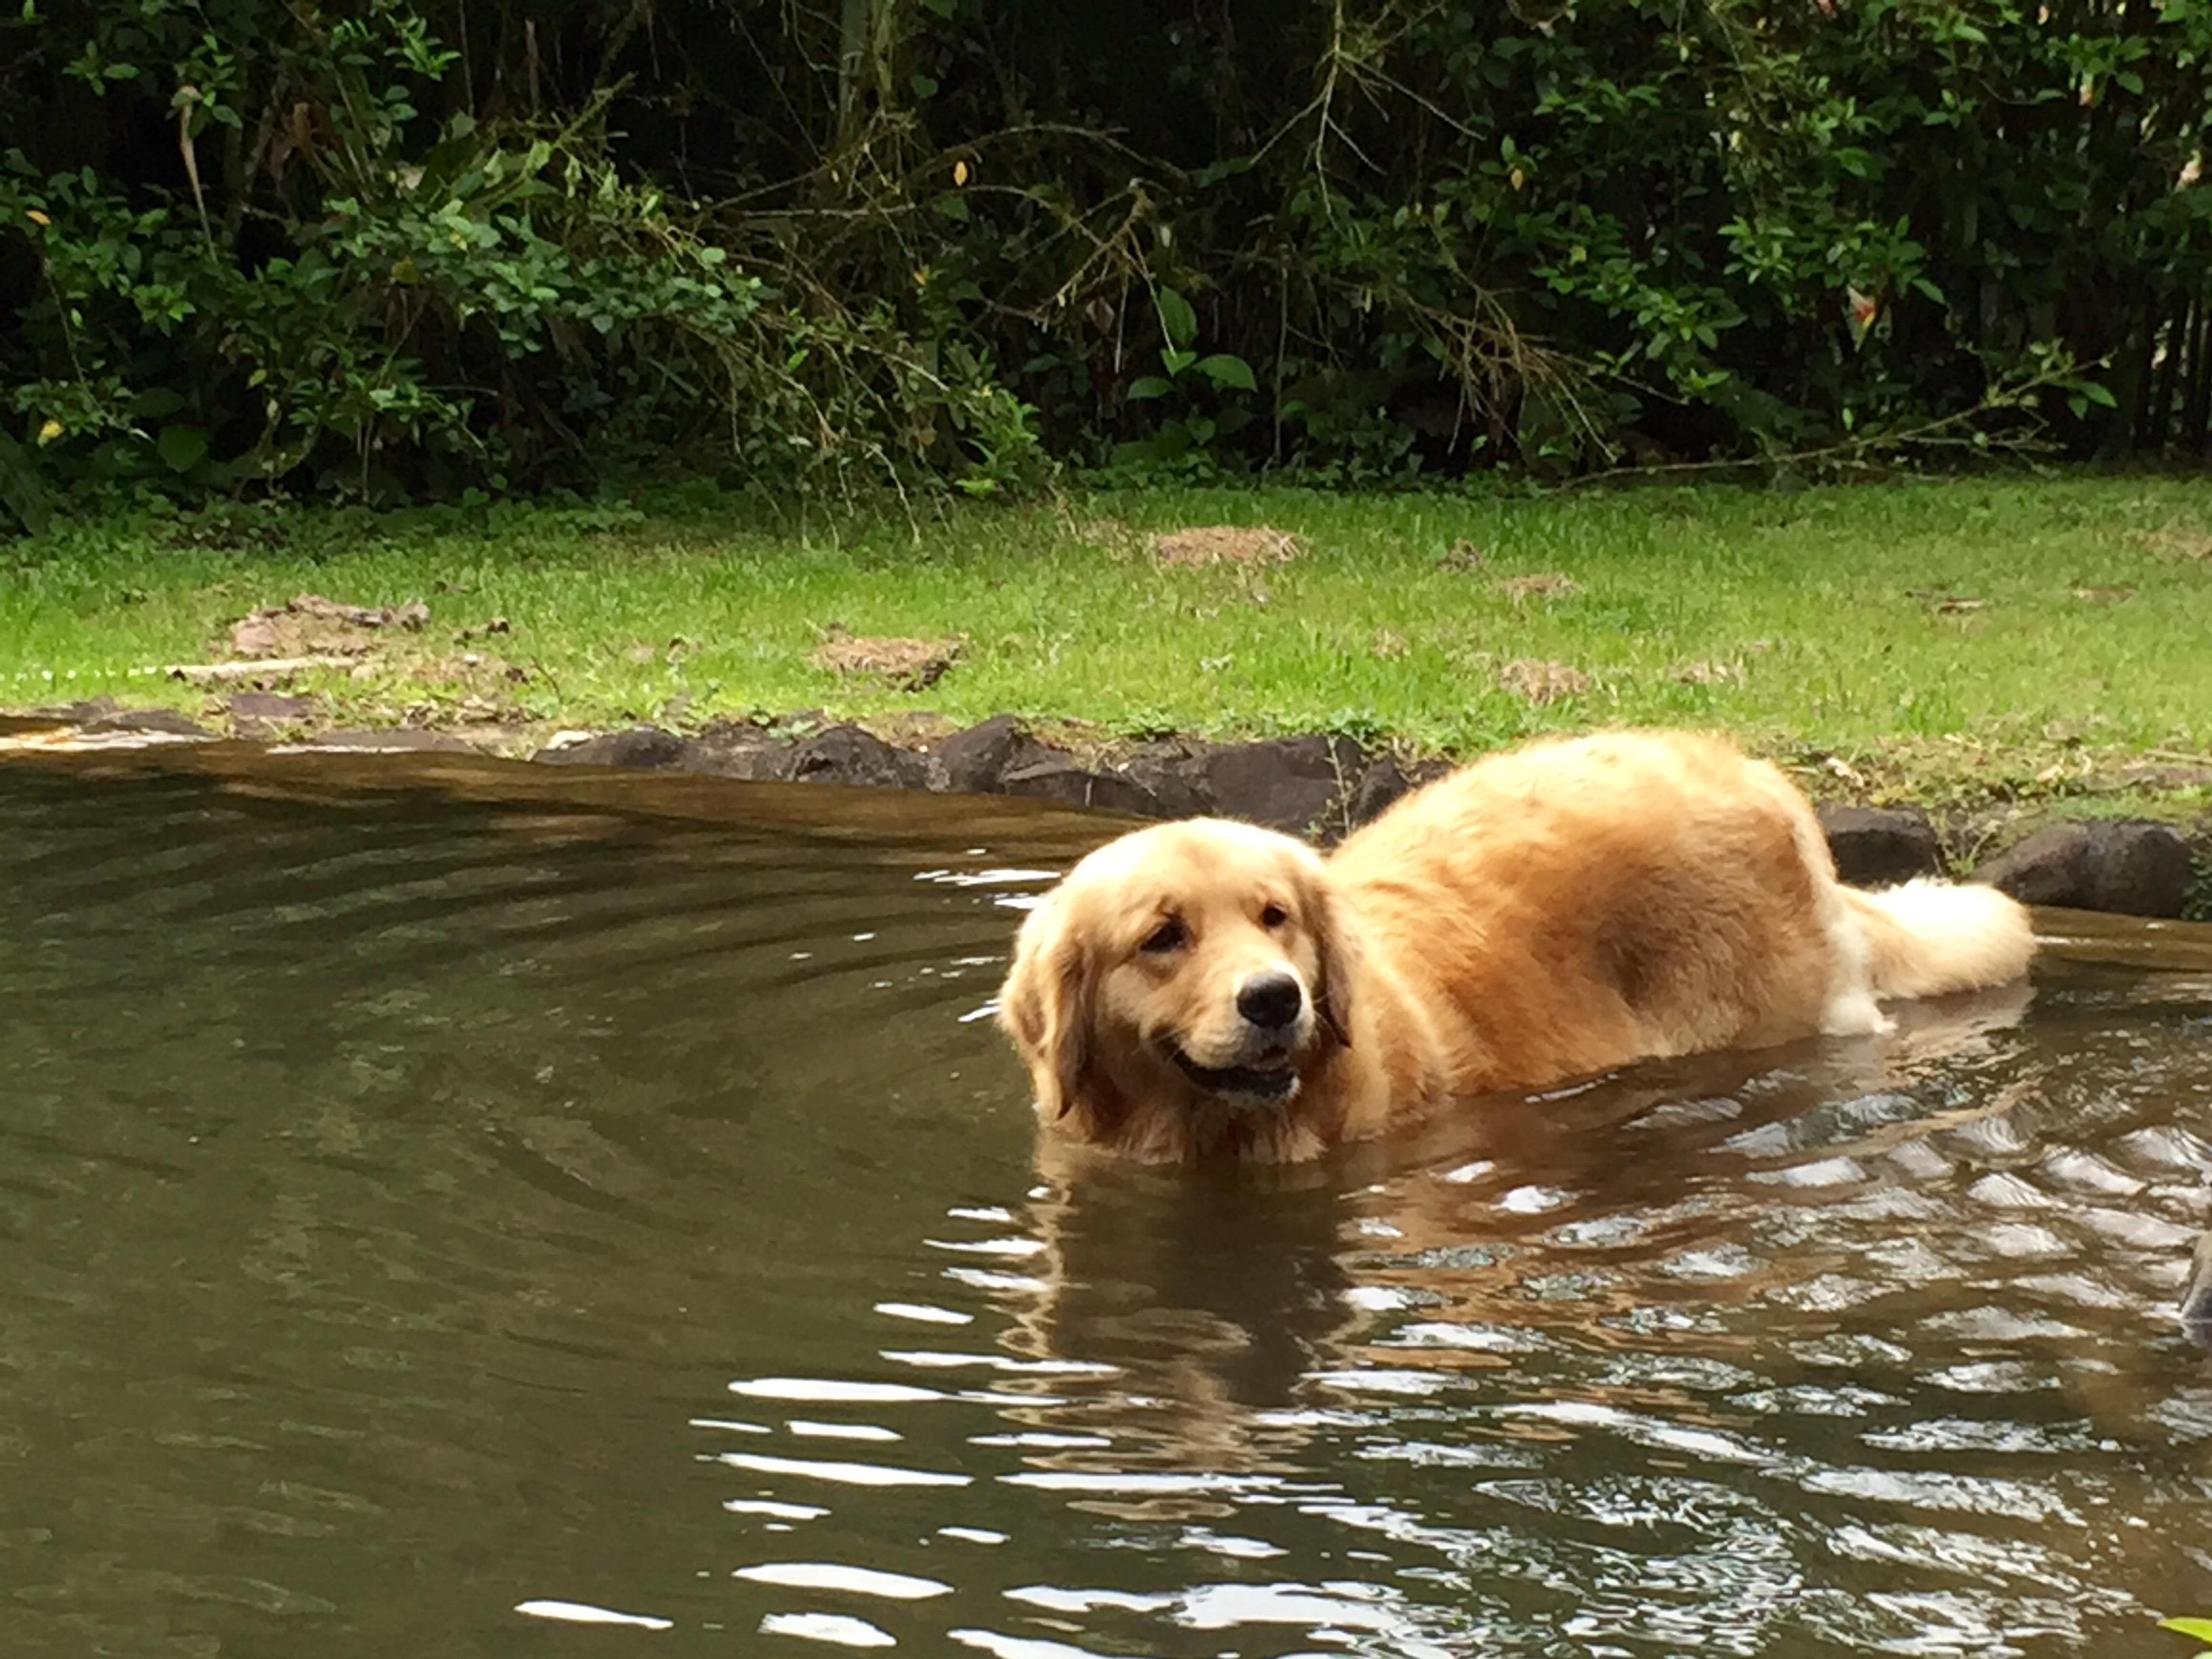 Ginger takes a bath